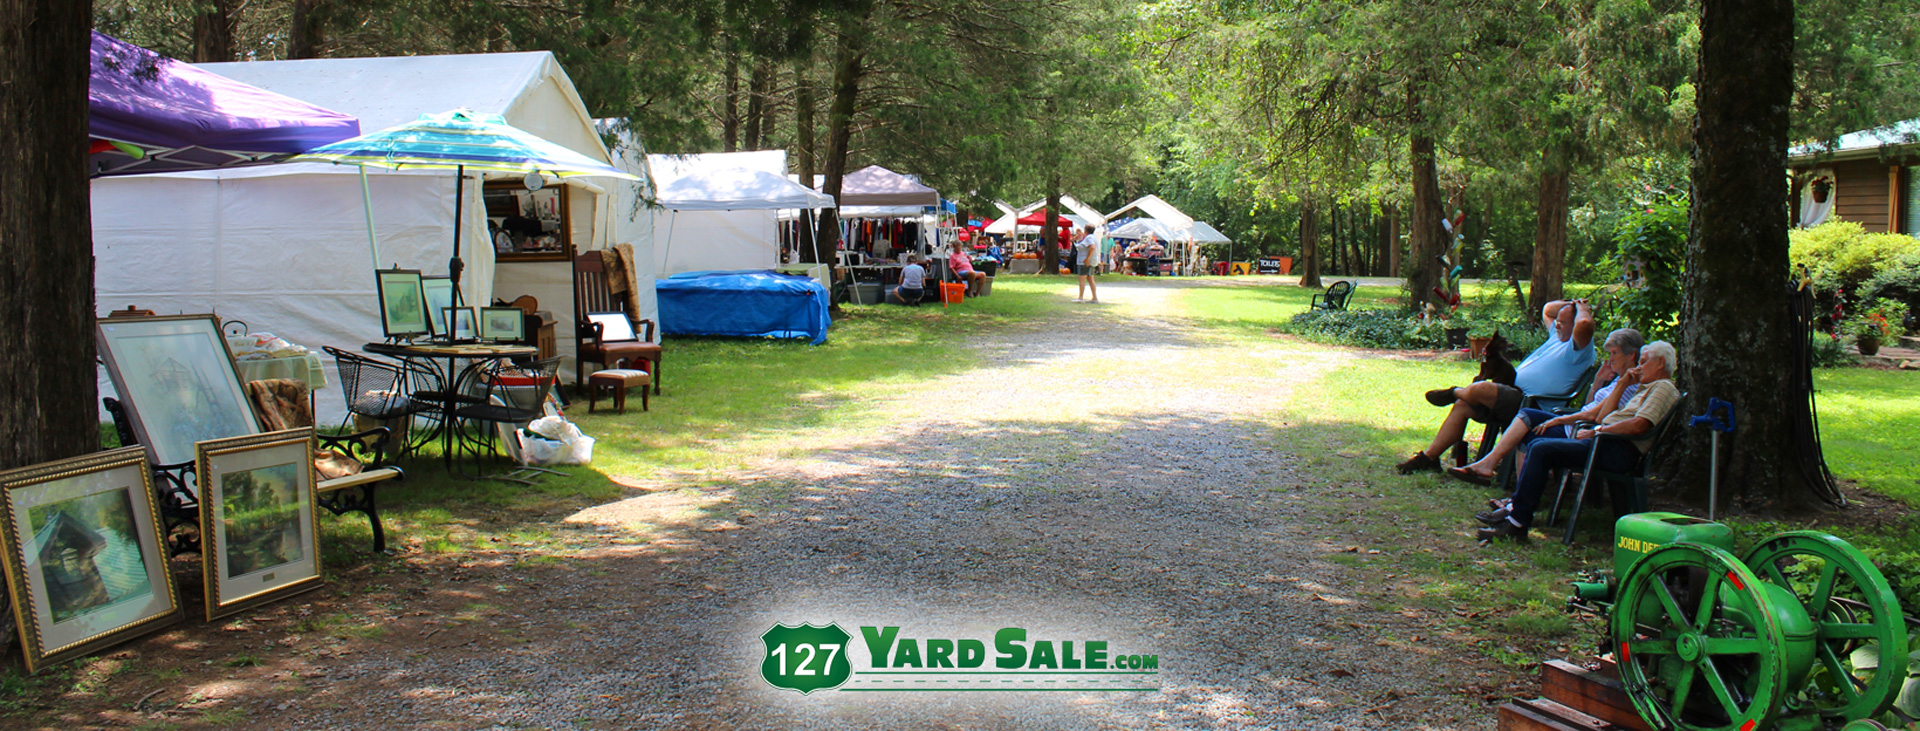 127 Yard Sale - The World\'s Longest Yard Sale! August 6-9 ...